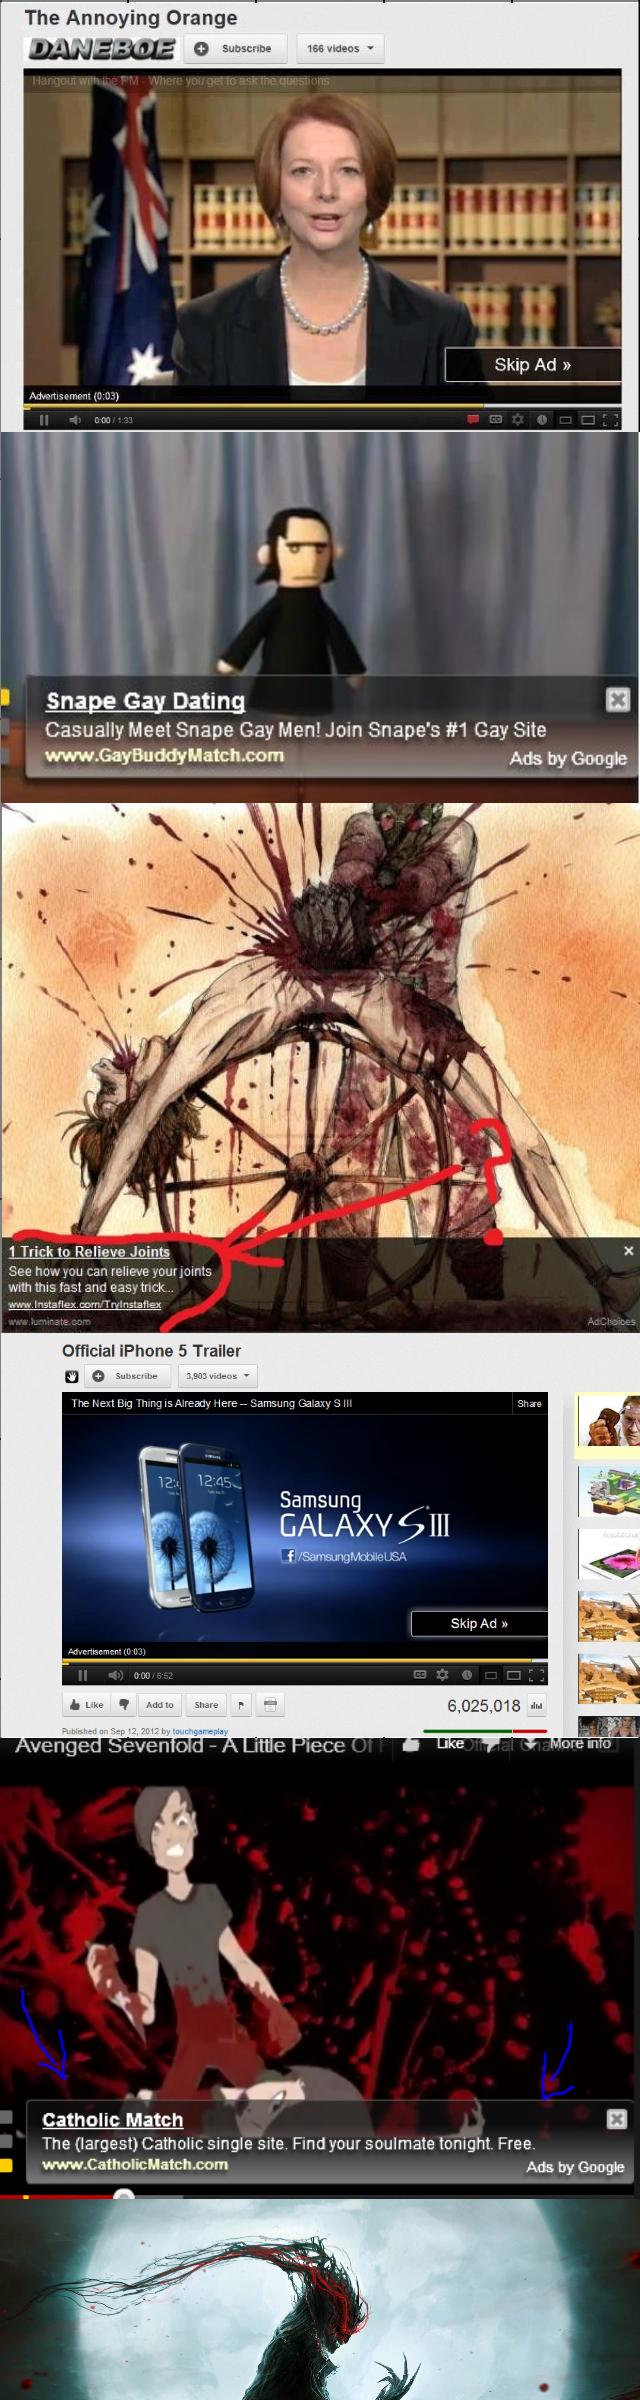 Those advertisements. .